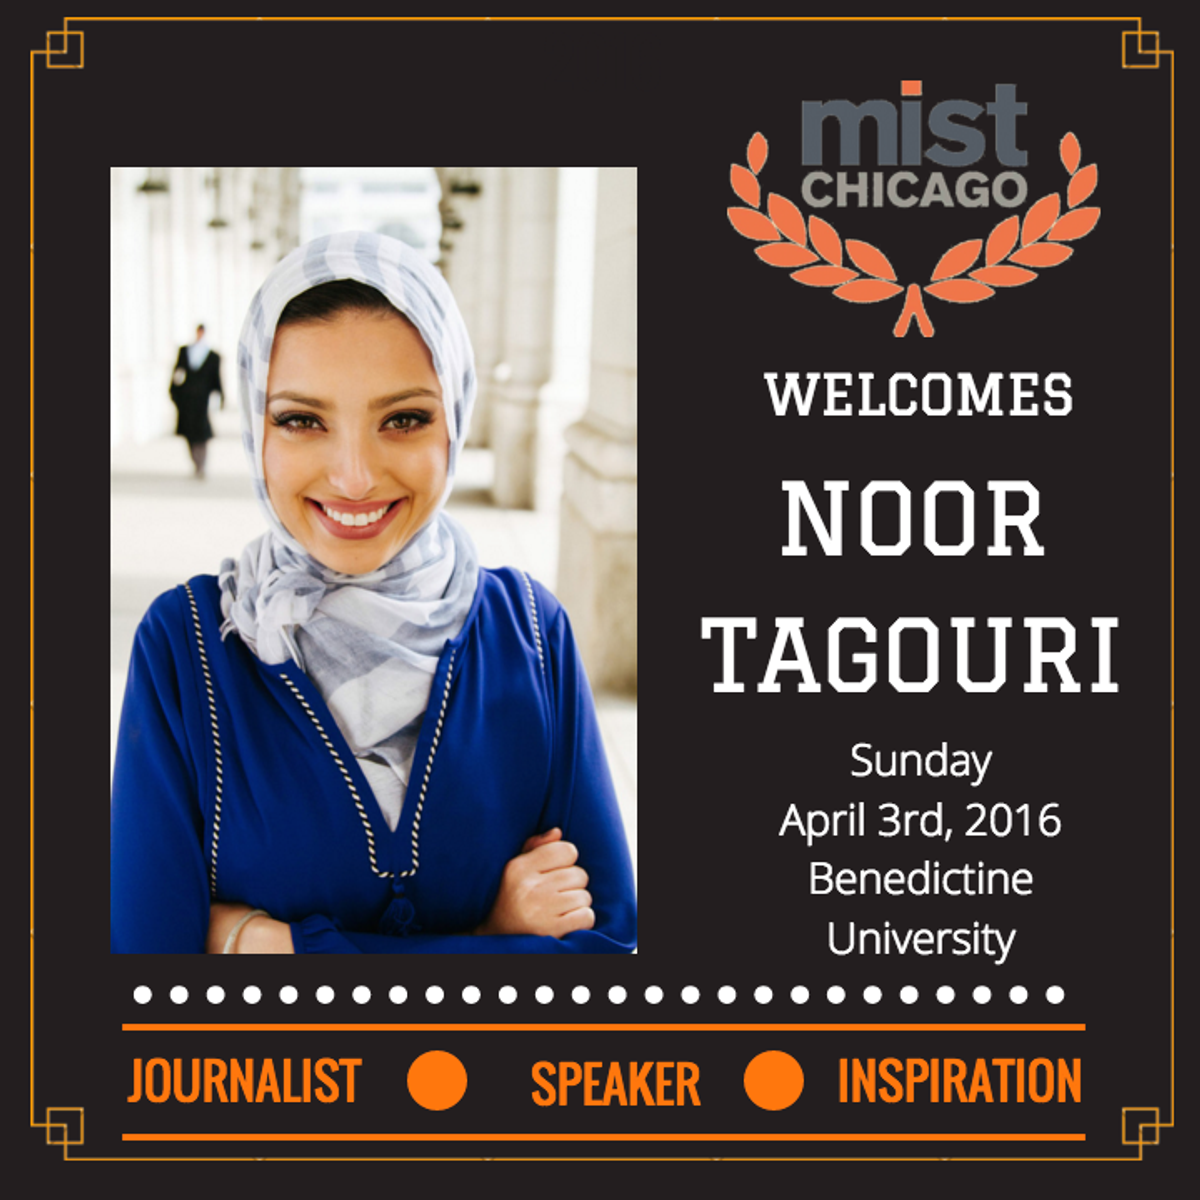 Get MISTified with Noor Tagouri at Benedictine University